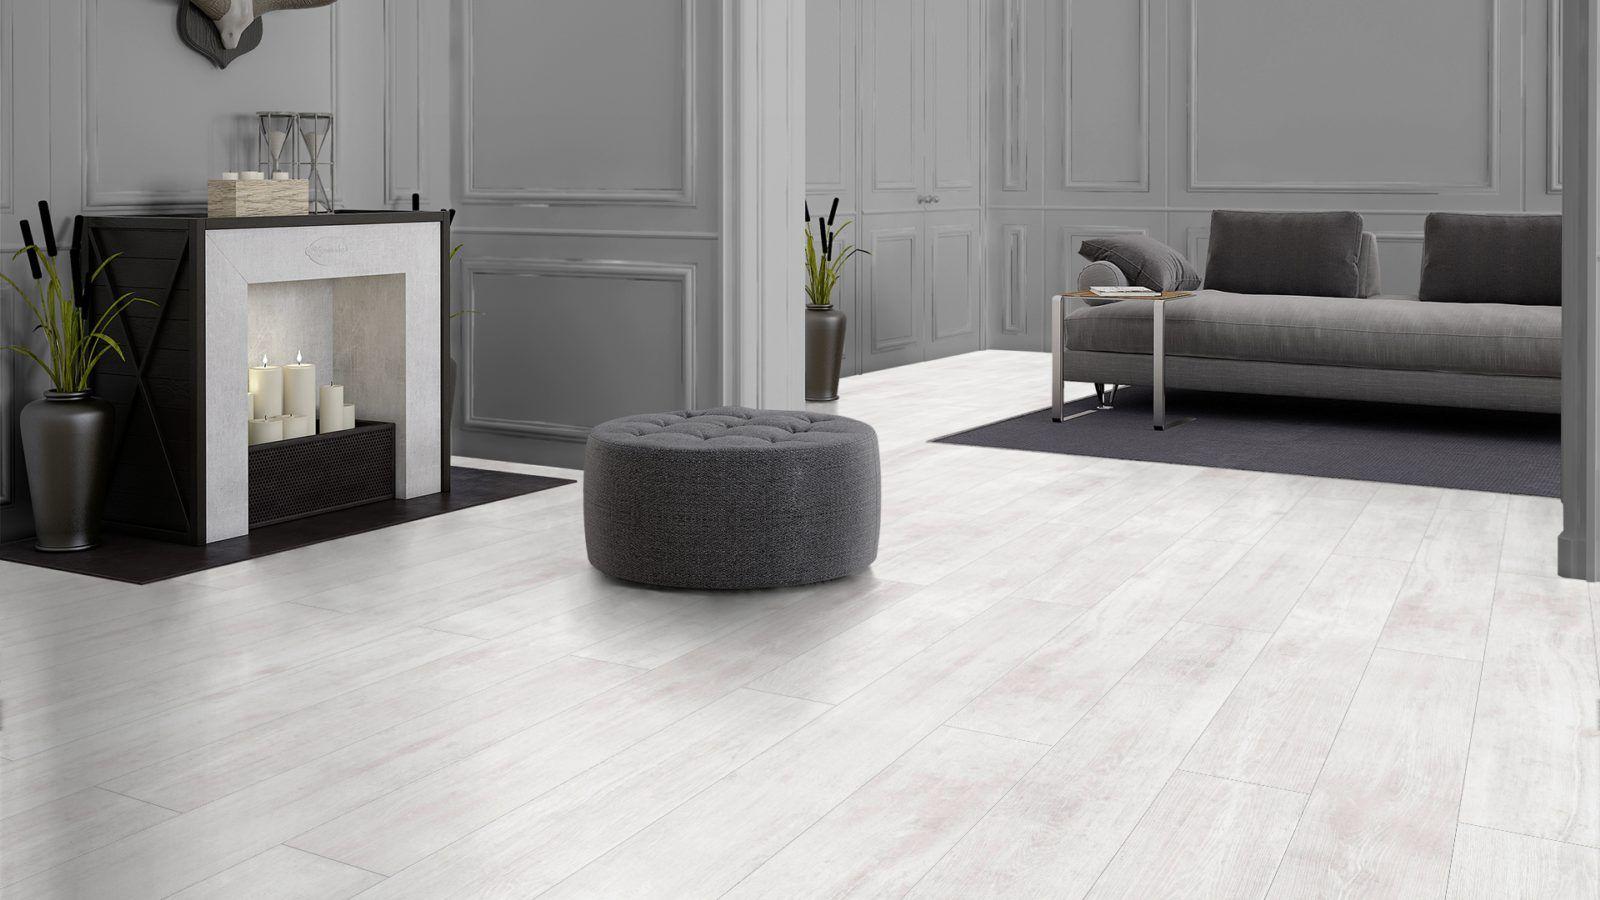 Sono Vanity White Carpet One Bismarck 419